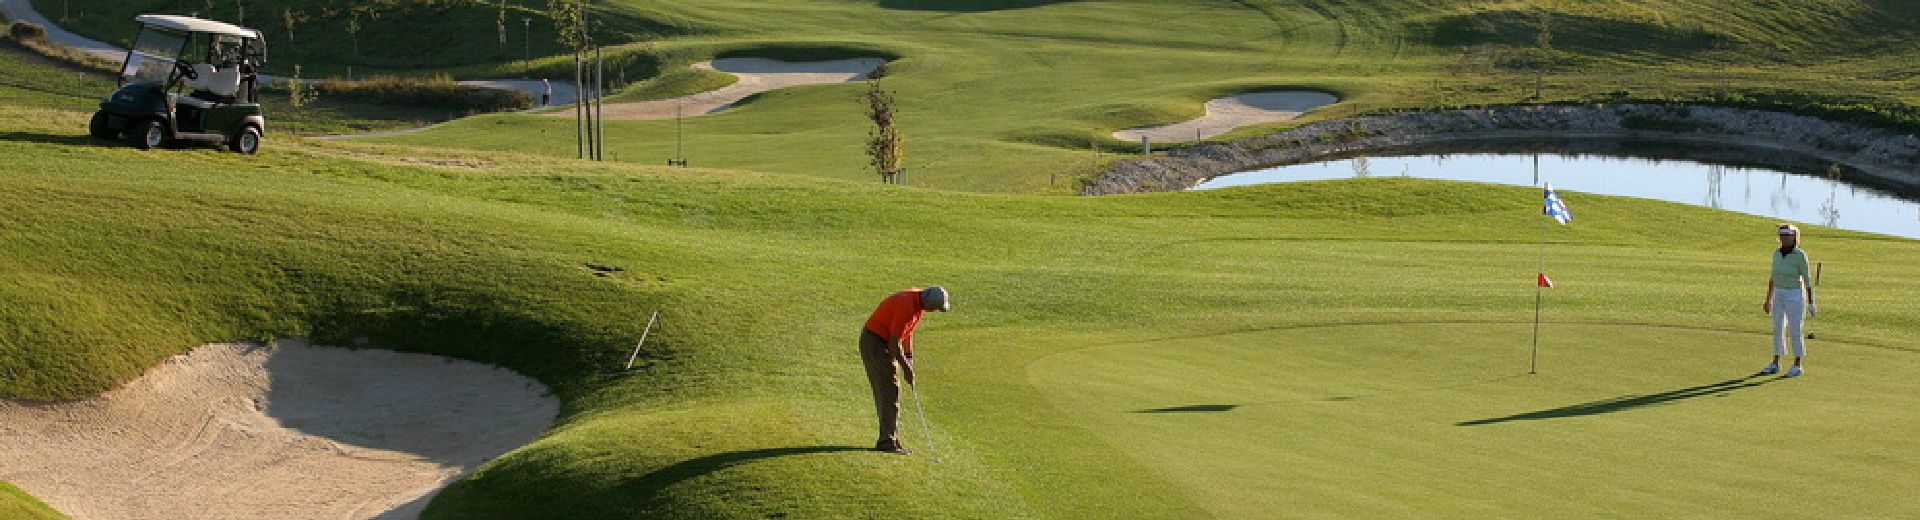 Golfclub Altötting-Burghausen e.V.